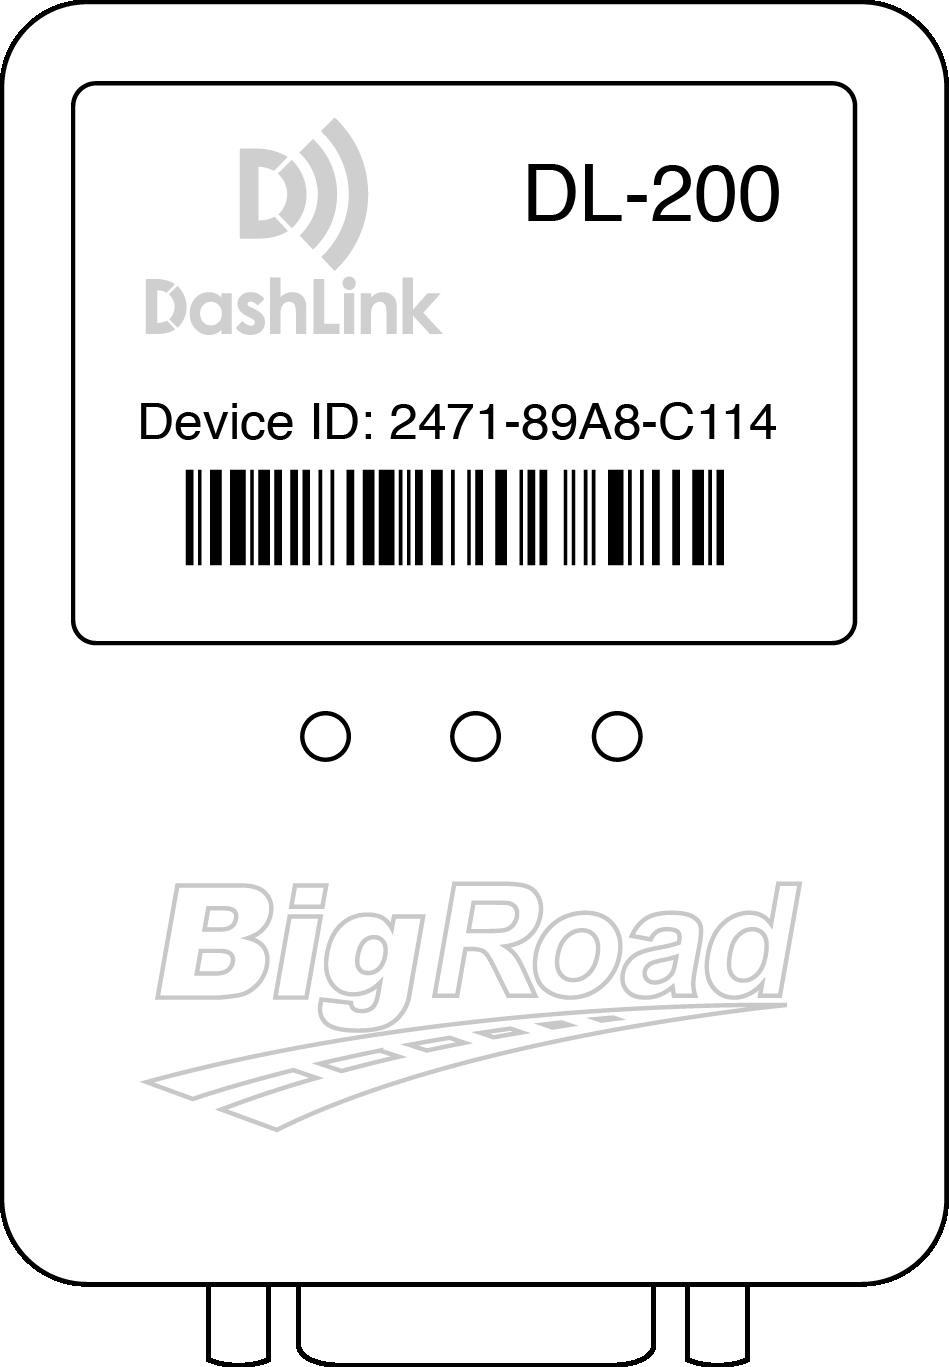 DashLink electronic logging device line drawing